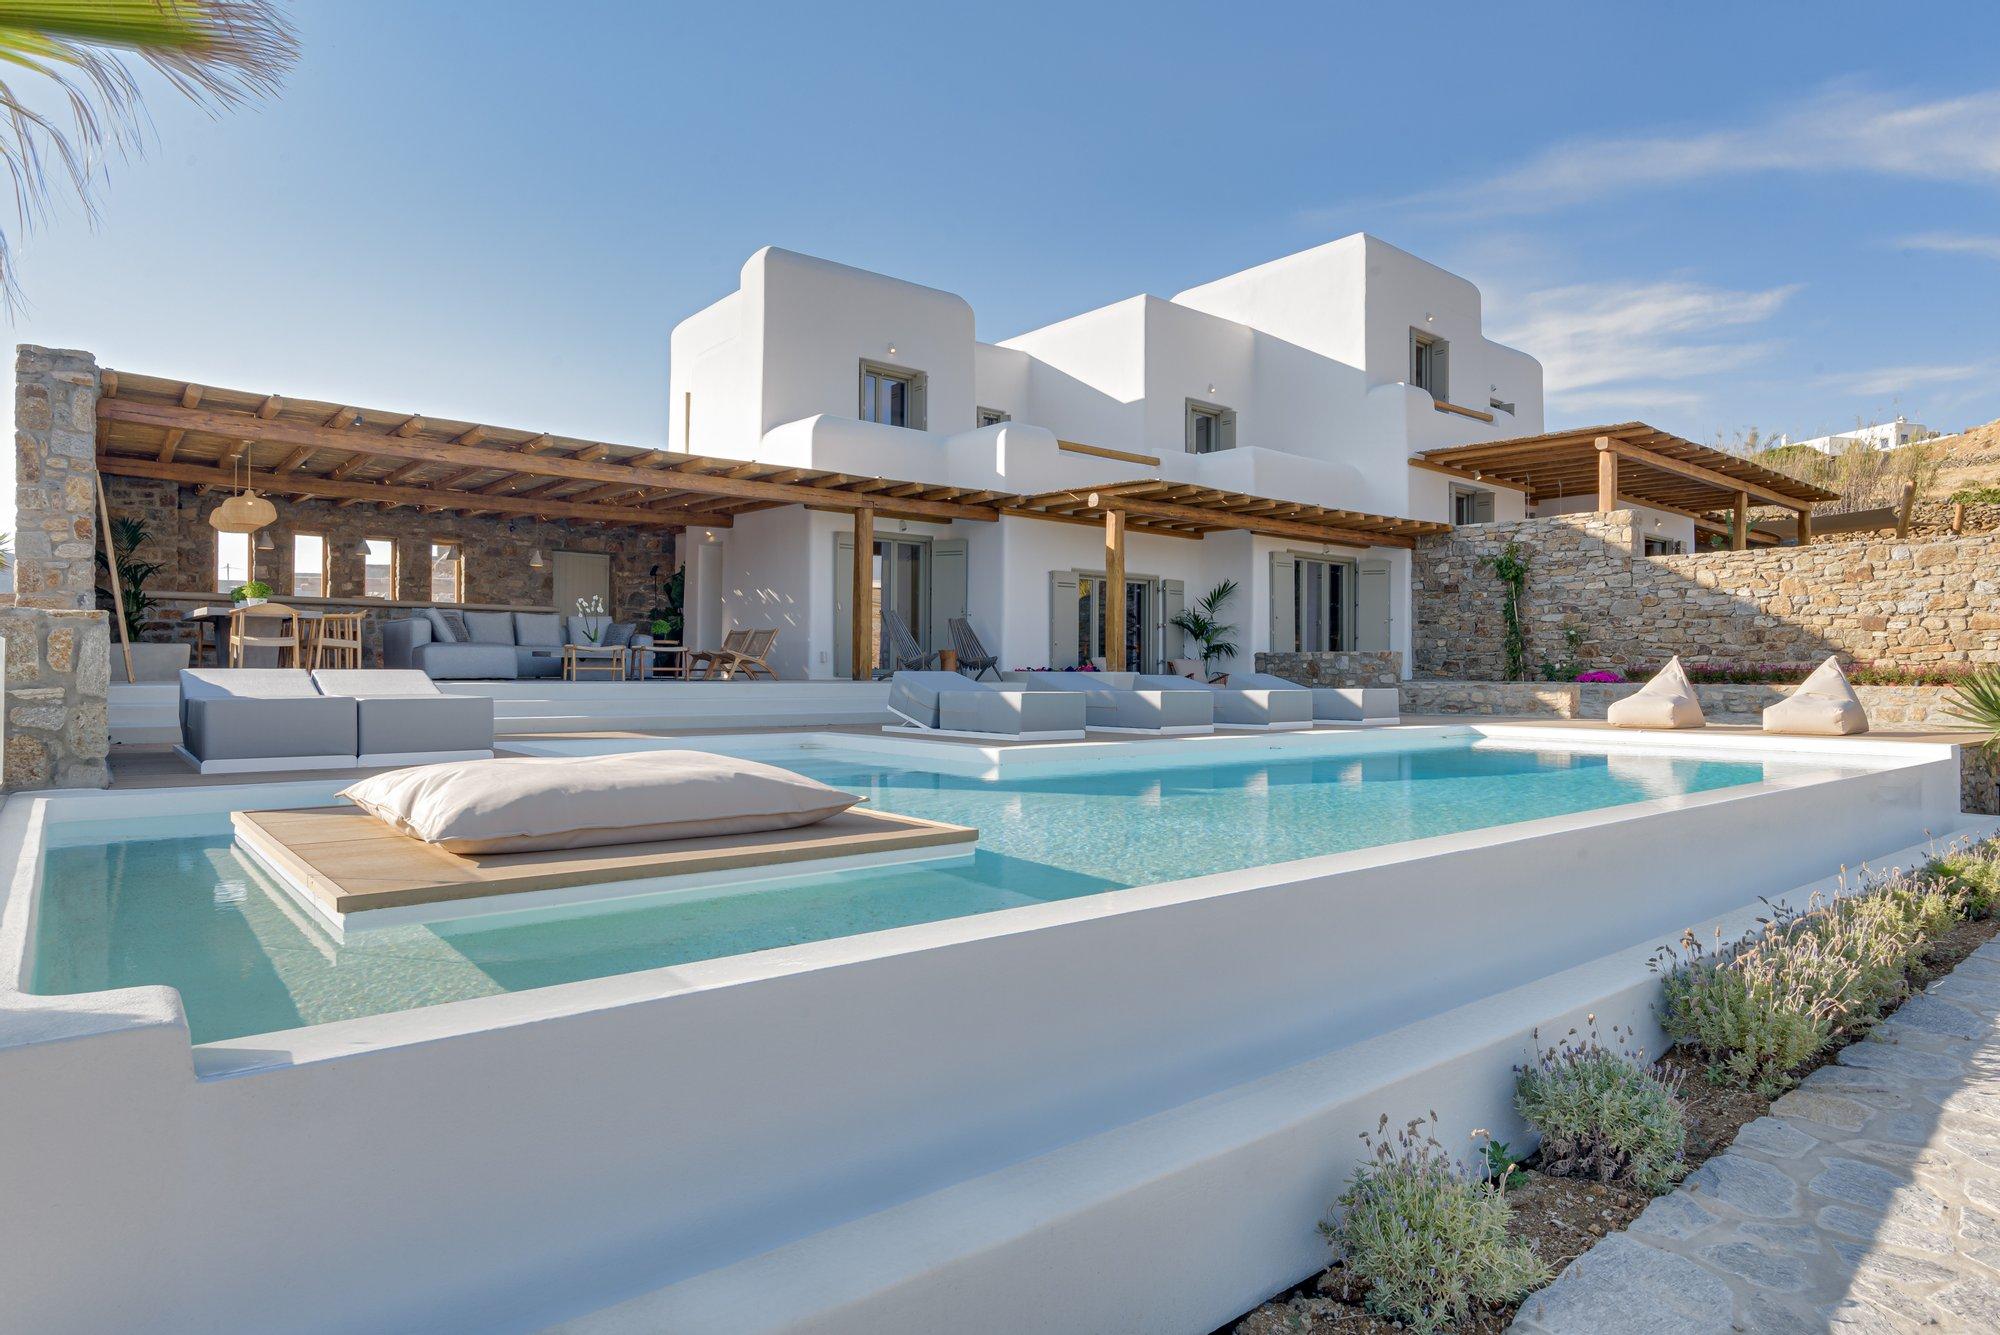 Villa in Kalafati, Decentralized Administration of the Aegean, Greece 1 - 11427235